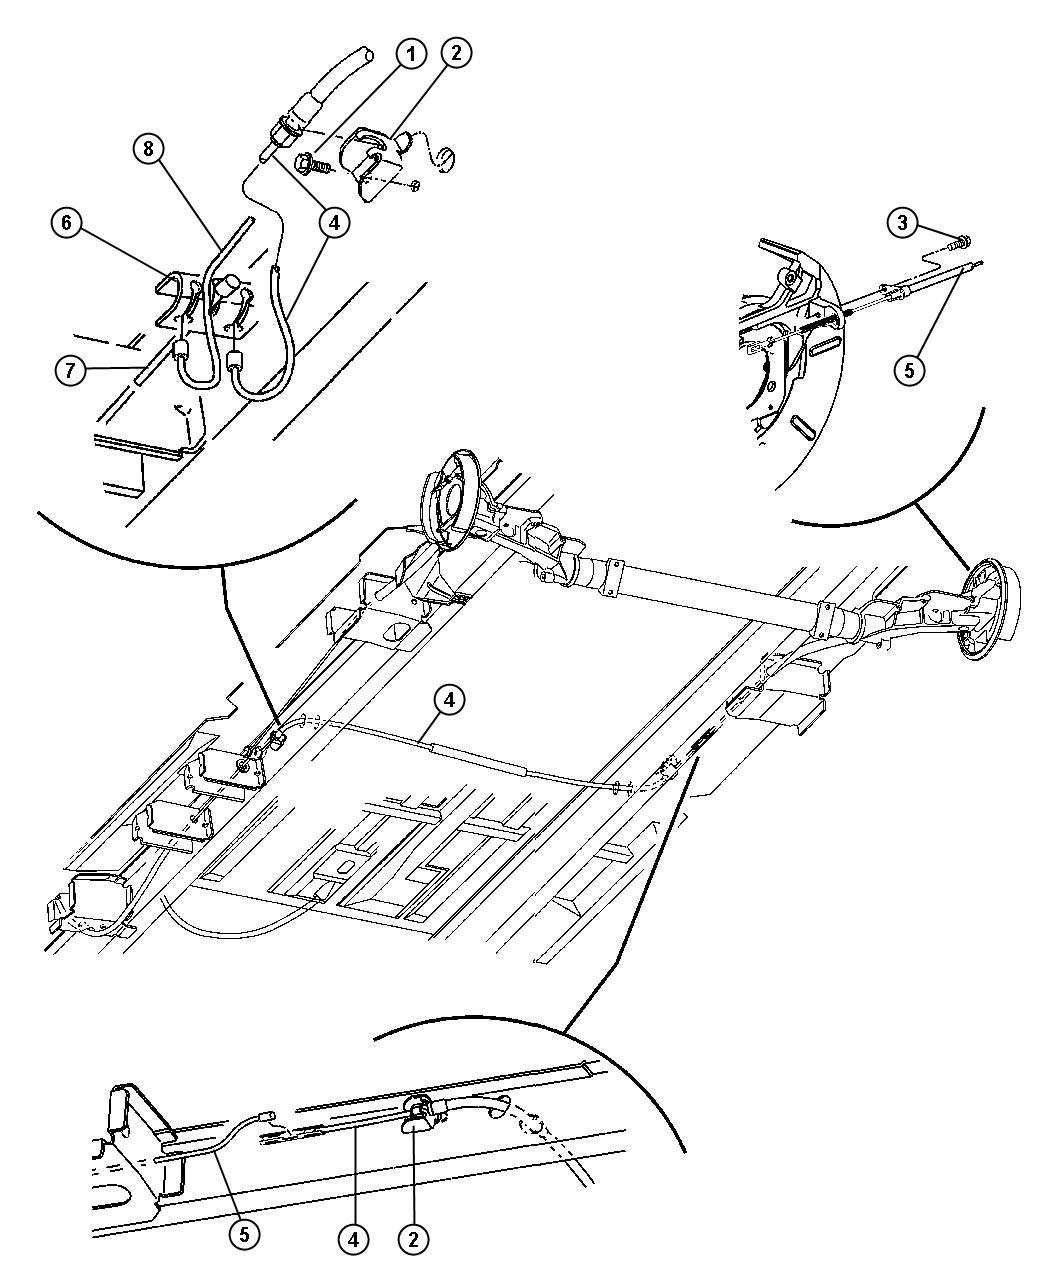 Acura rl fuse box diagram auto wiring besides happy birthday auto geek online auto additionally acura